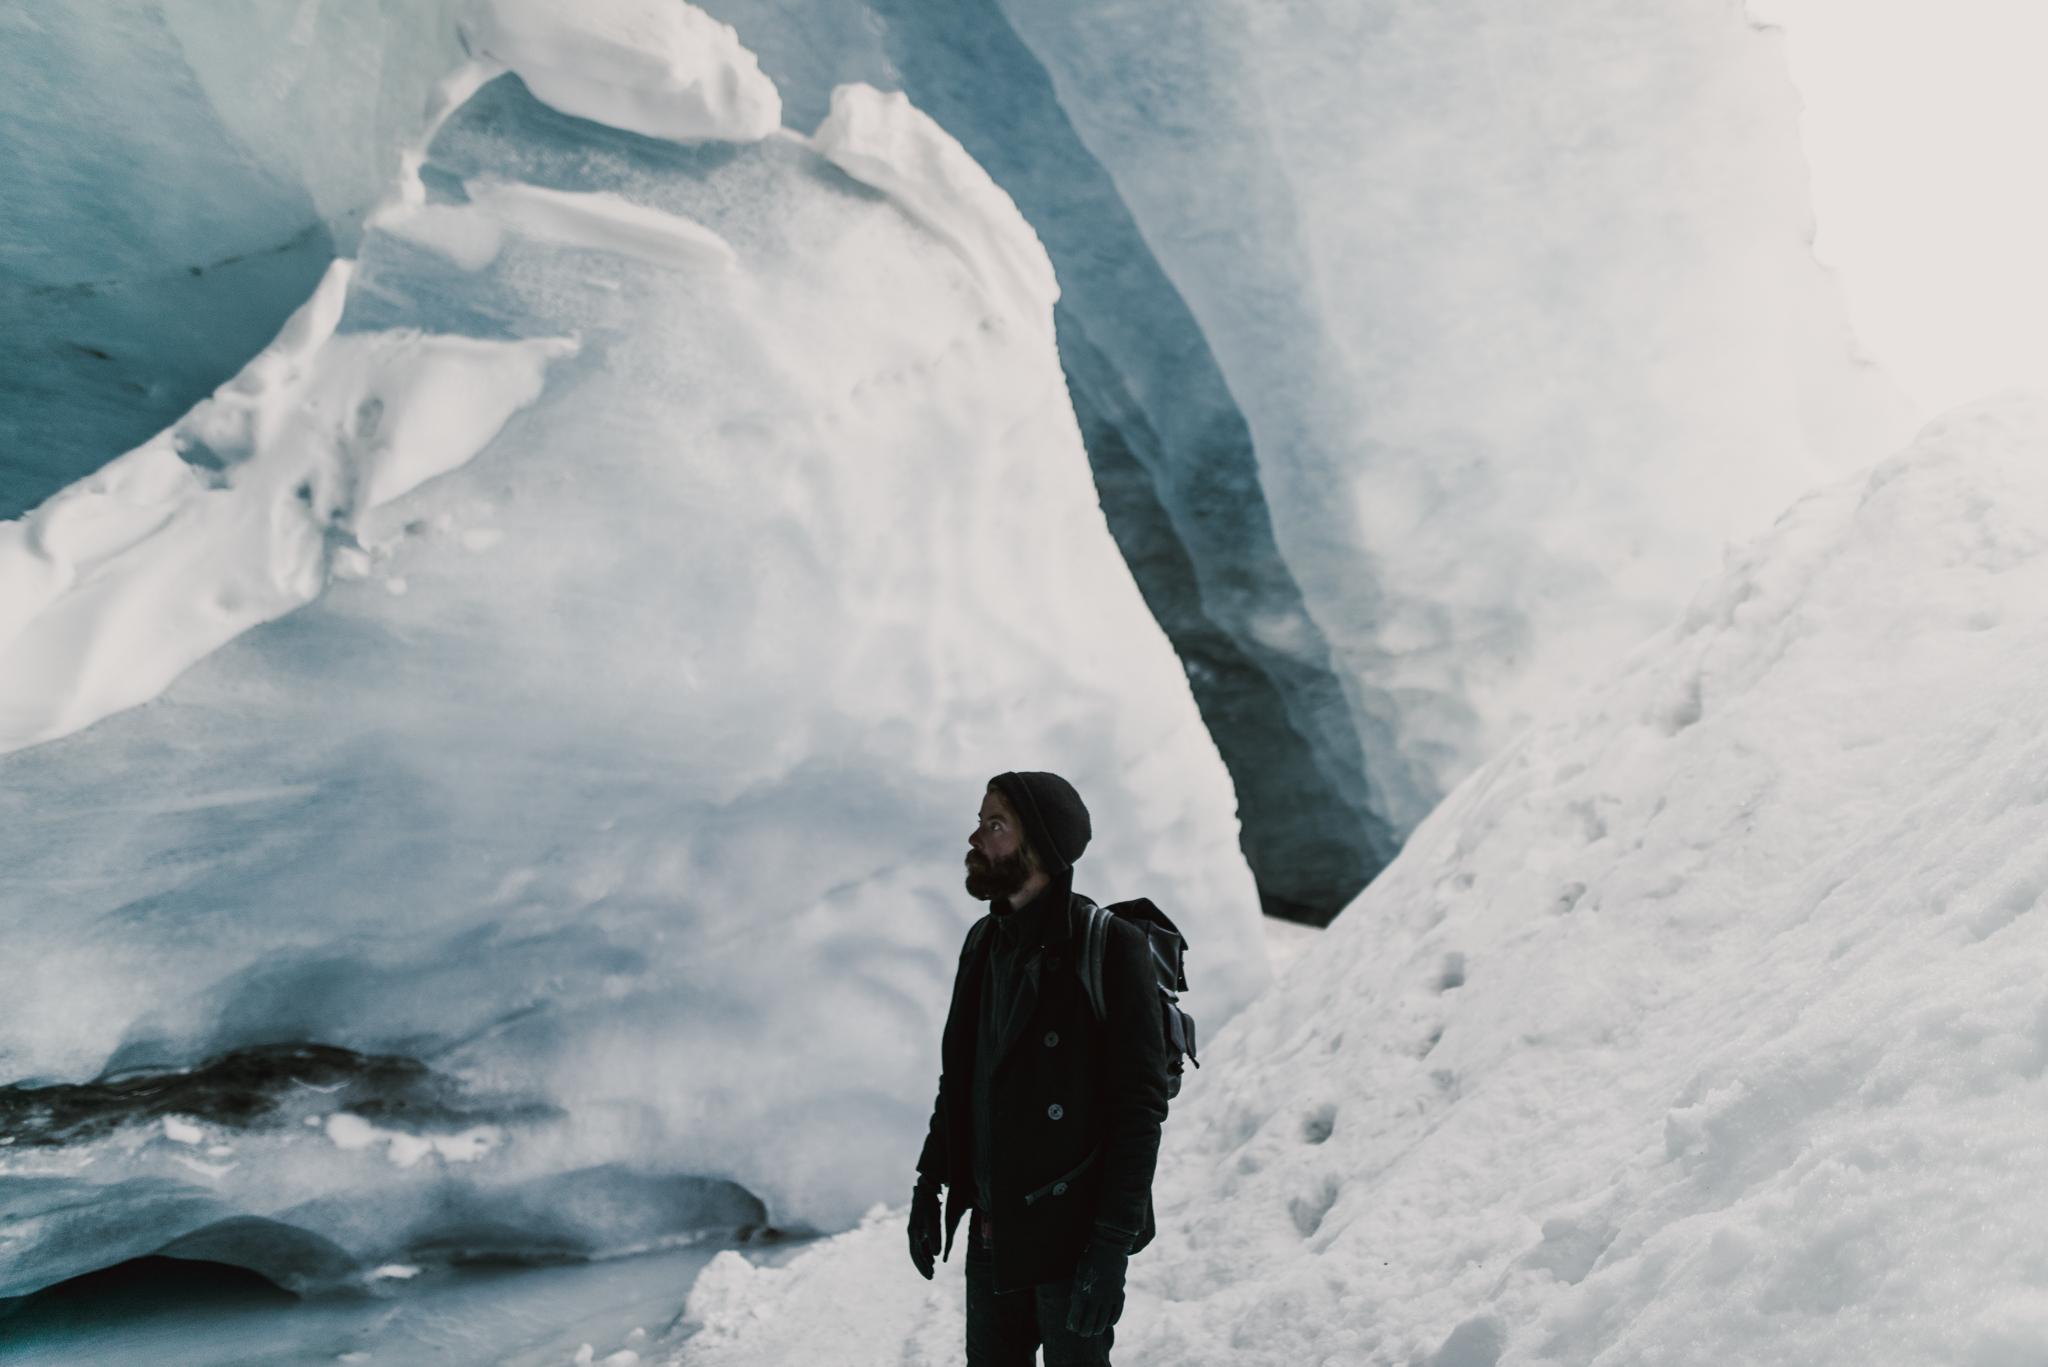 ©The-Ryans-Photo---Athabasca-Glacier,-Ice-Cave-036.jpg